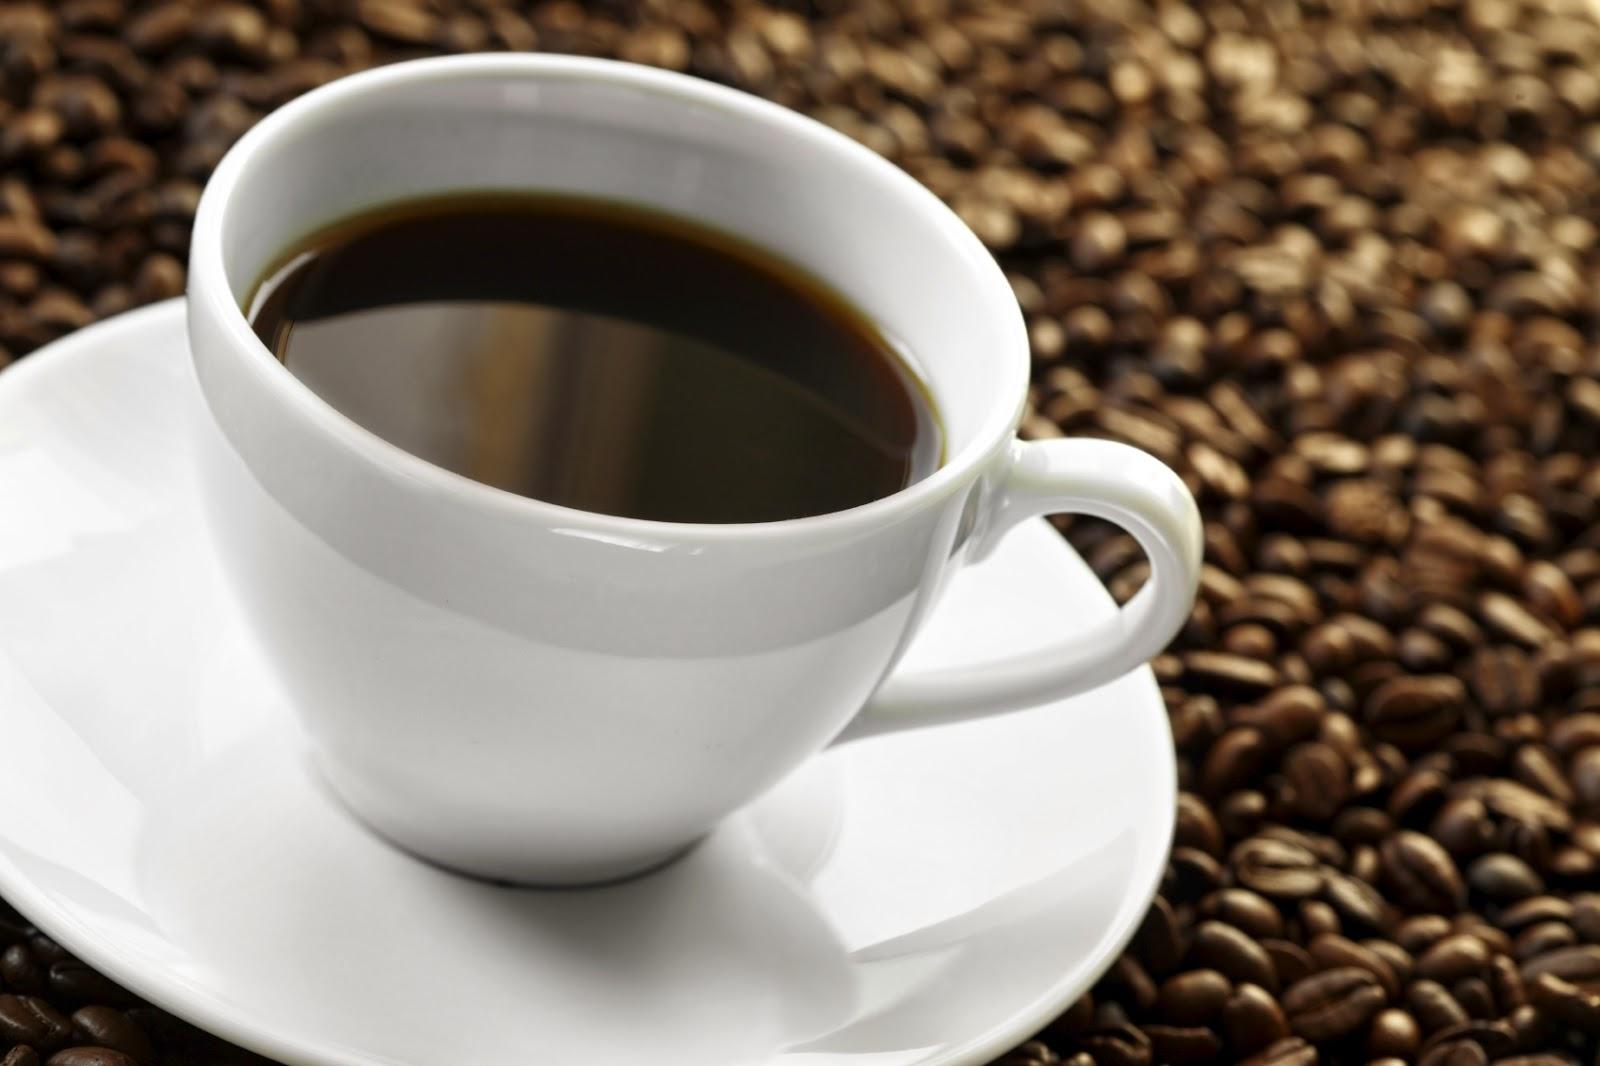 resep kopi hitam